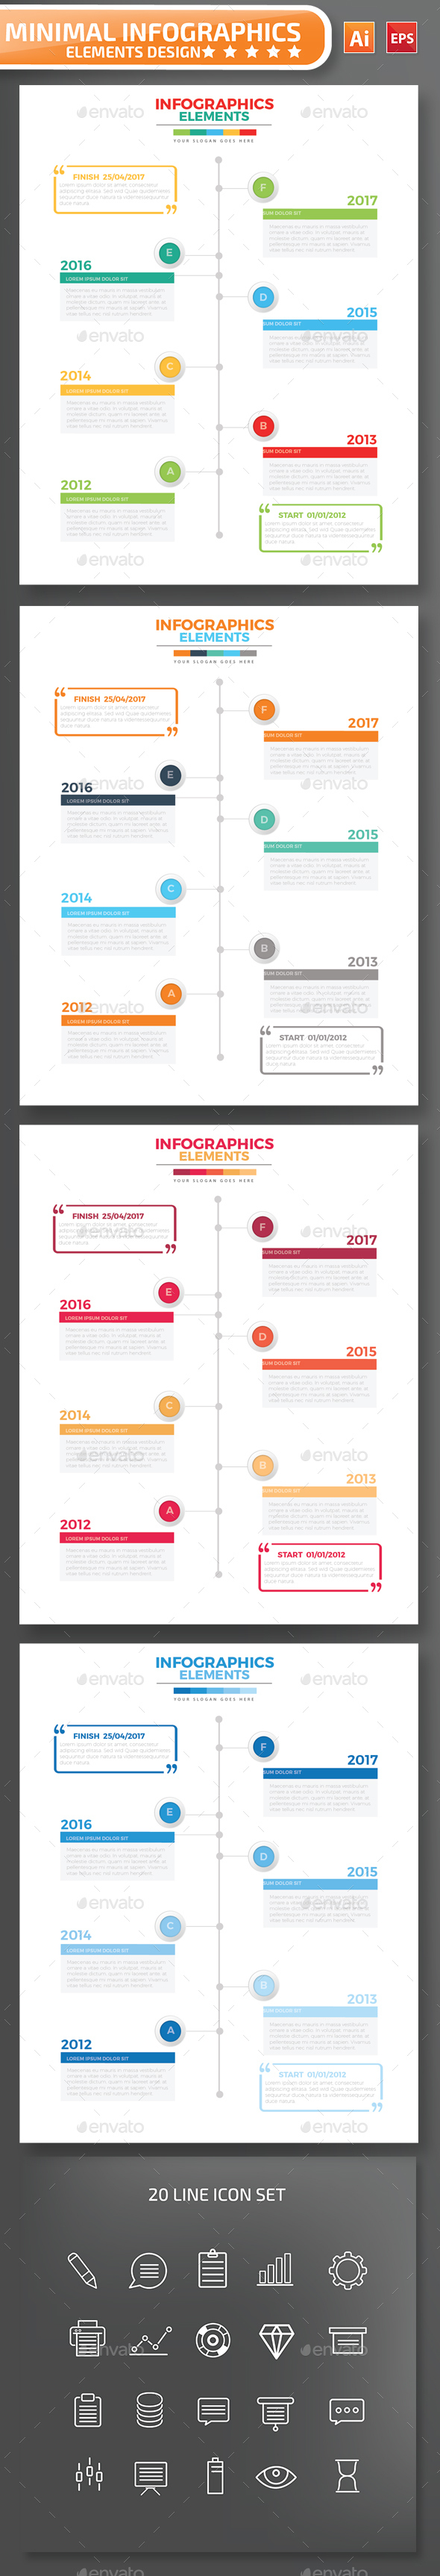 Minimal Timeline infographic Design